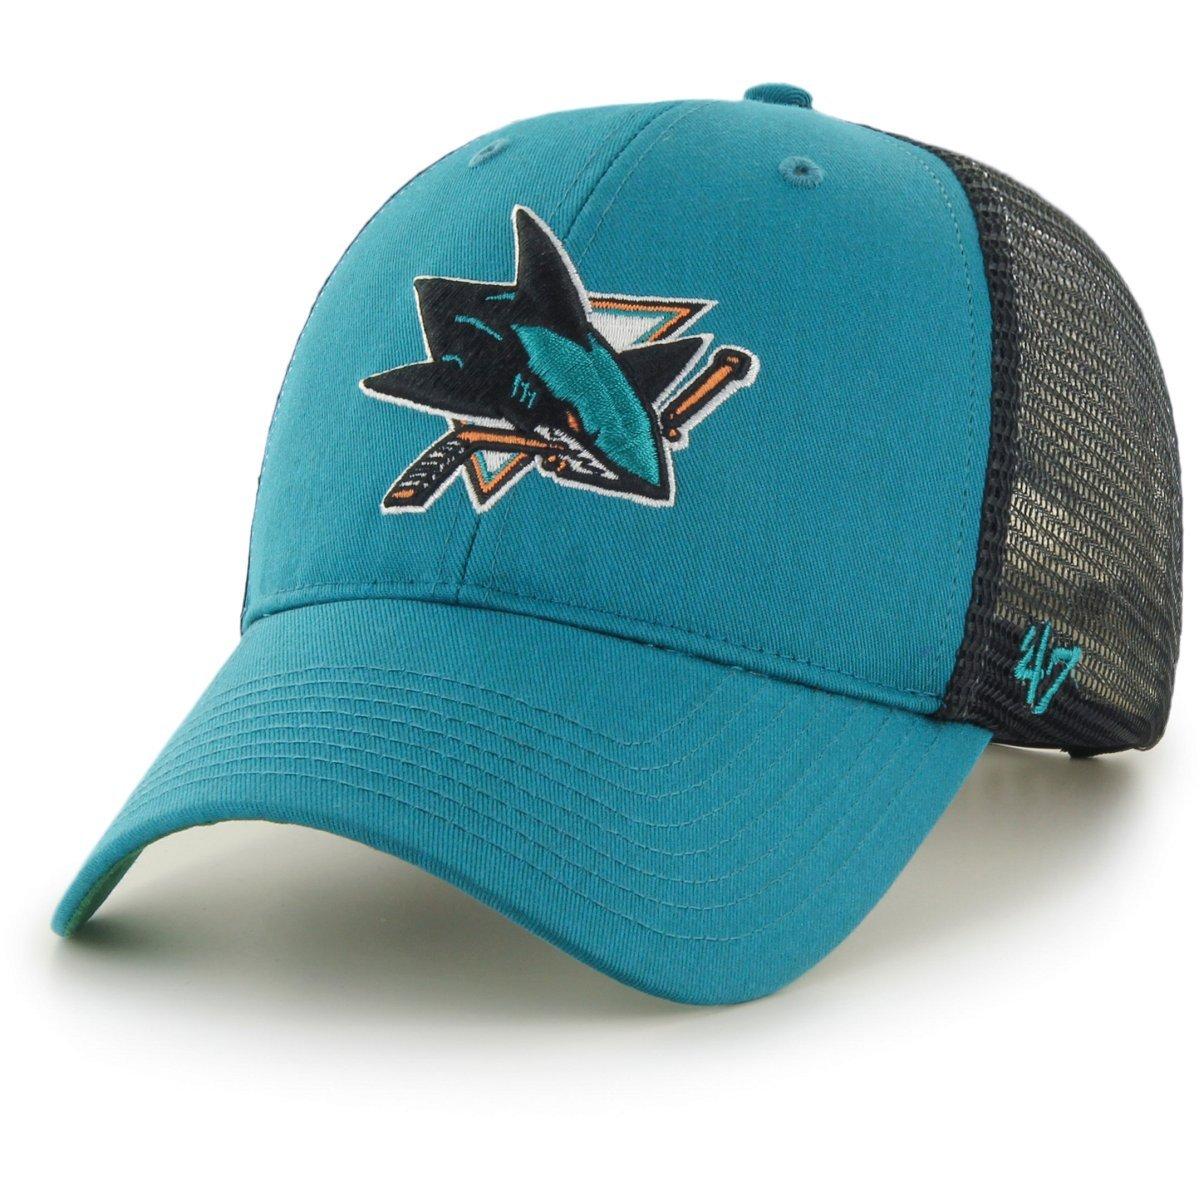 47brand San Jose Sharks Mvp Curved Adjustable Cap Weitere Wintersportarten